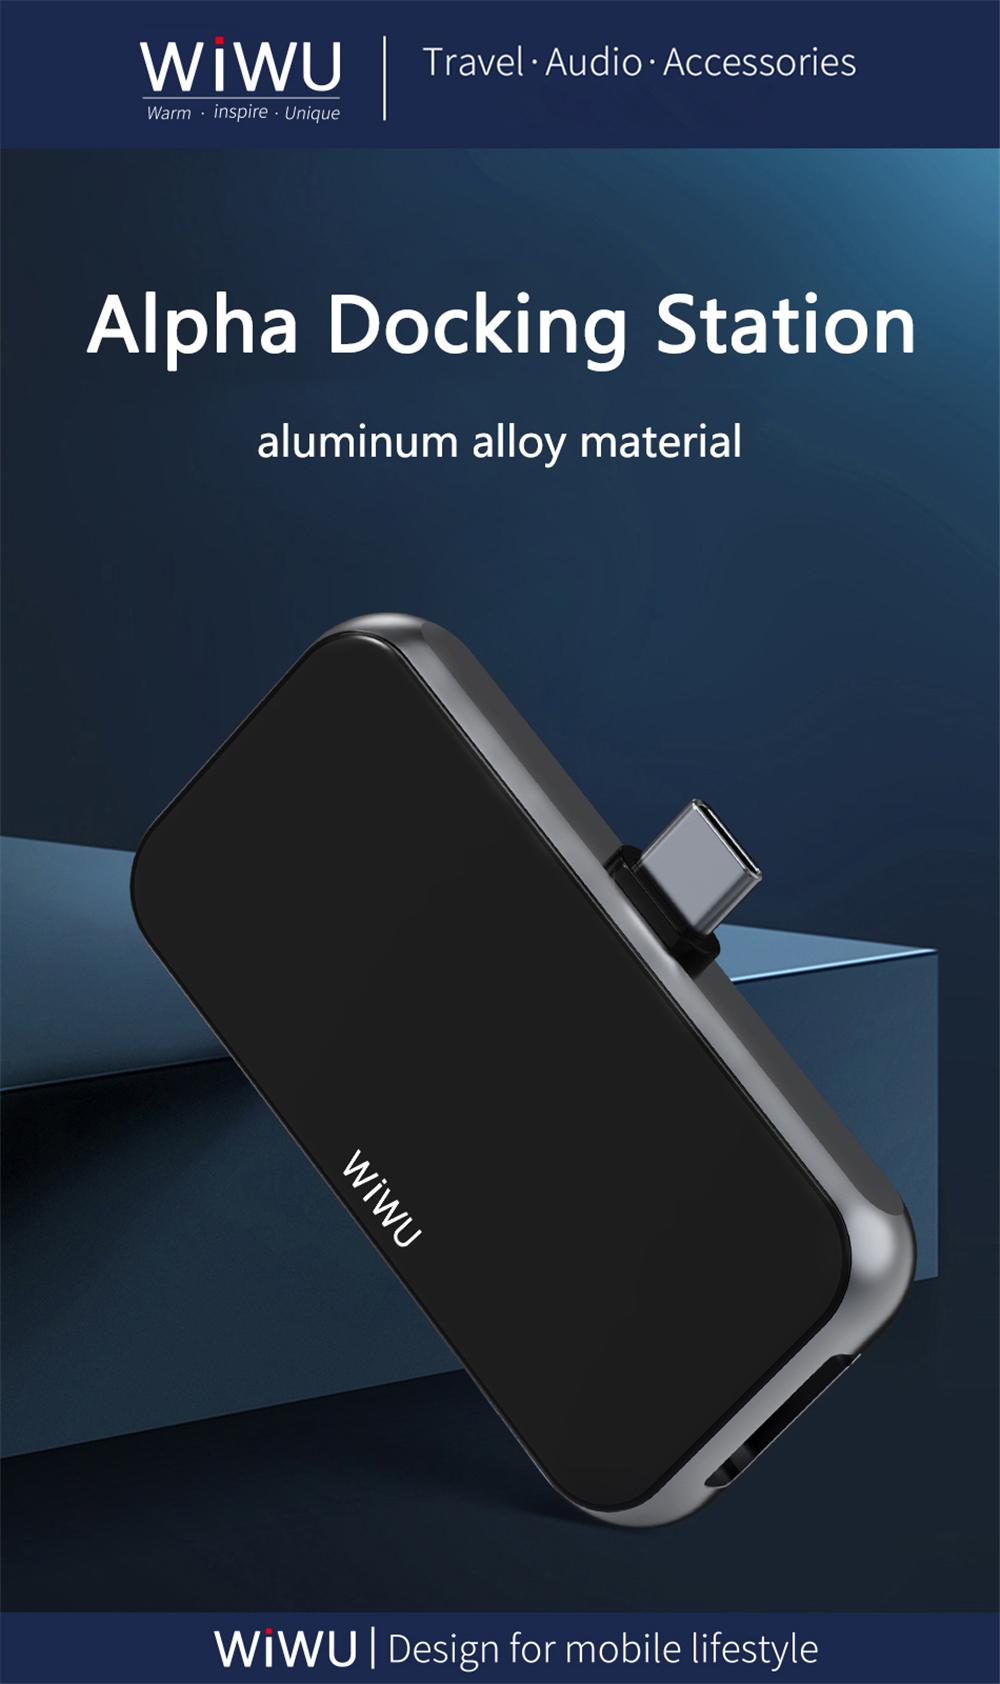 WiWU T5 Pro with 3.5mm Audio HDMI USB 3.0 Type C 4 in 1 Hub